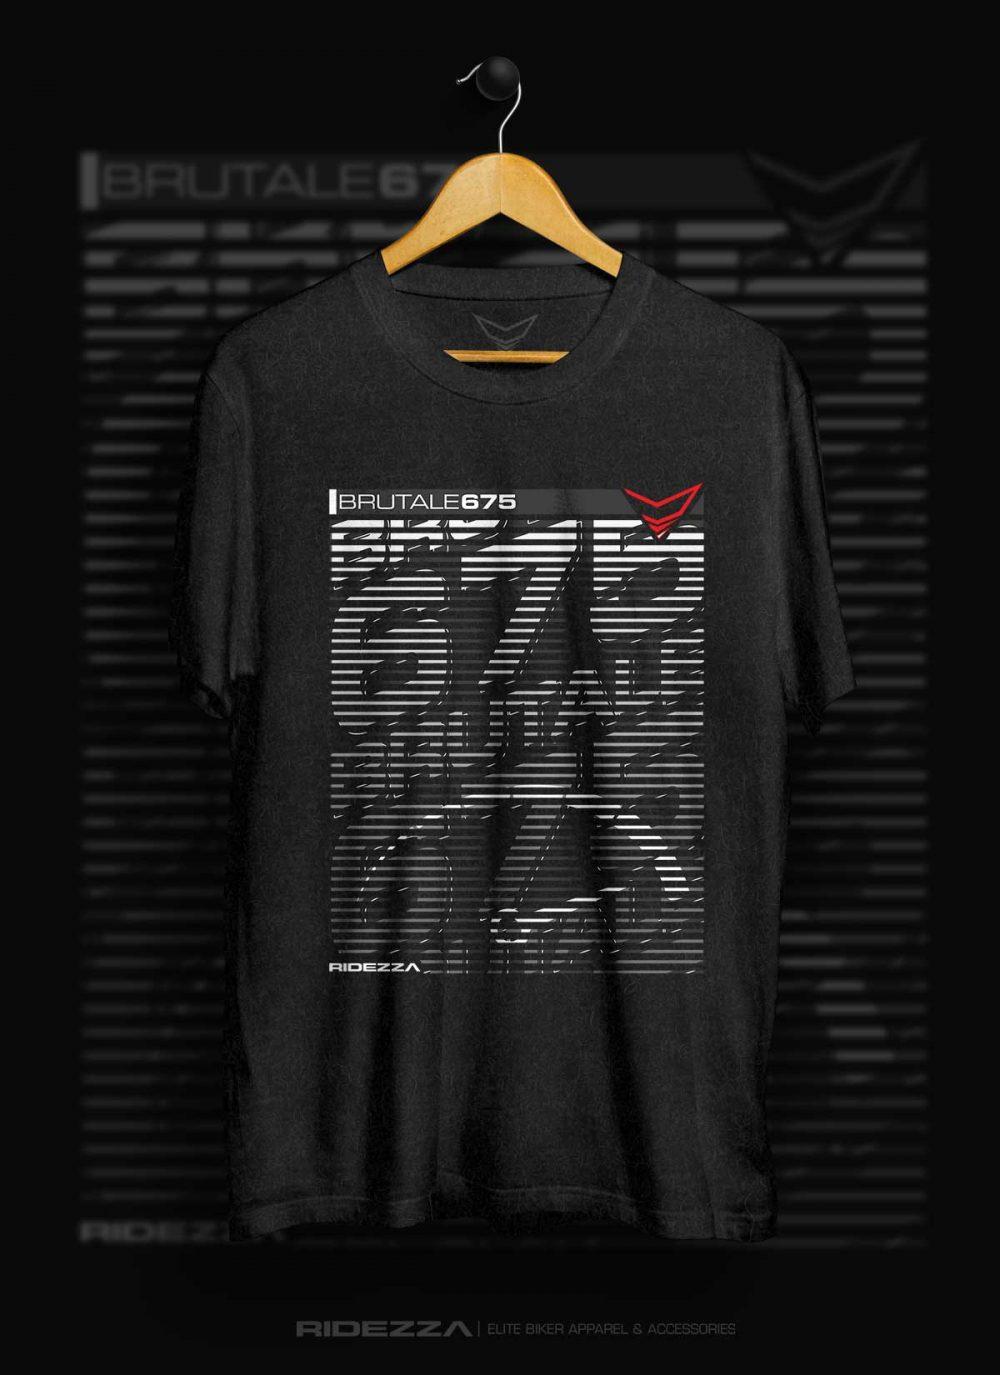 MV Agusta Brutale 675 Speedy T-Shirt